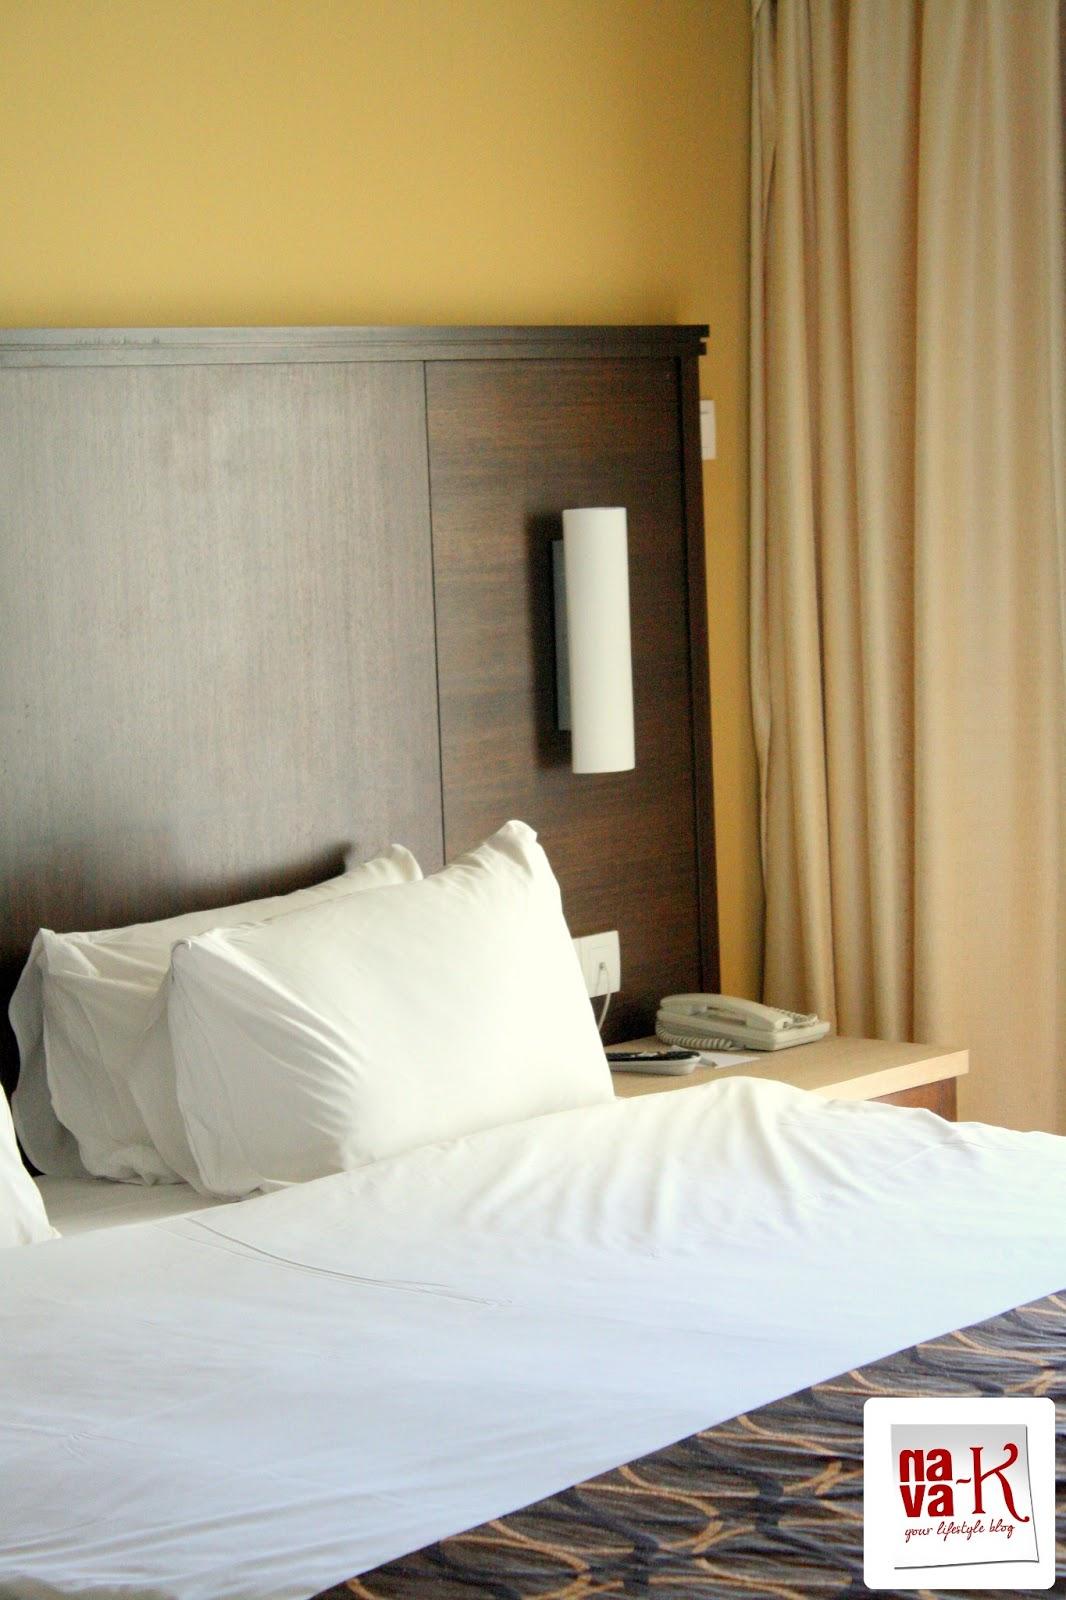 2 Bedroom Suites Portland Oregon: 2 Bedroom Suite (Jalan Tanjung